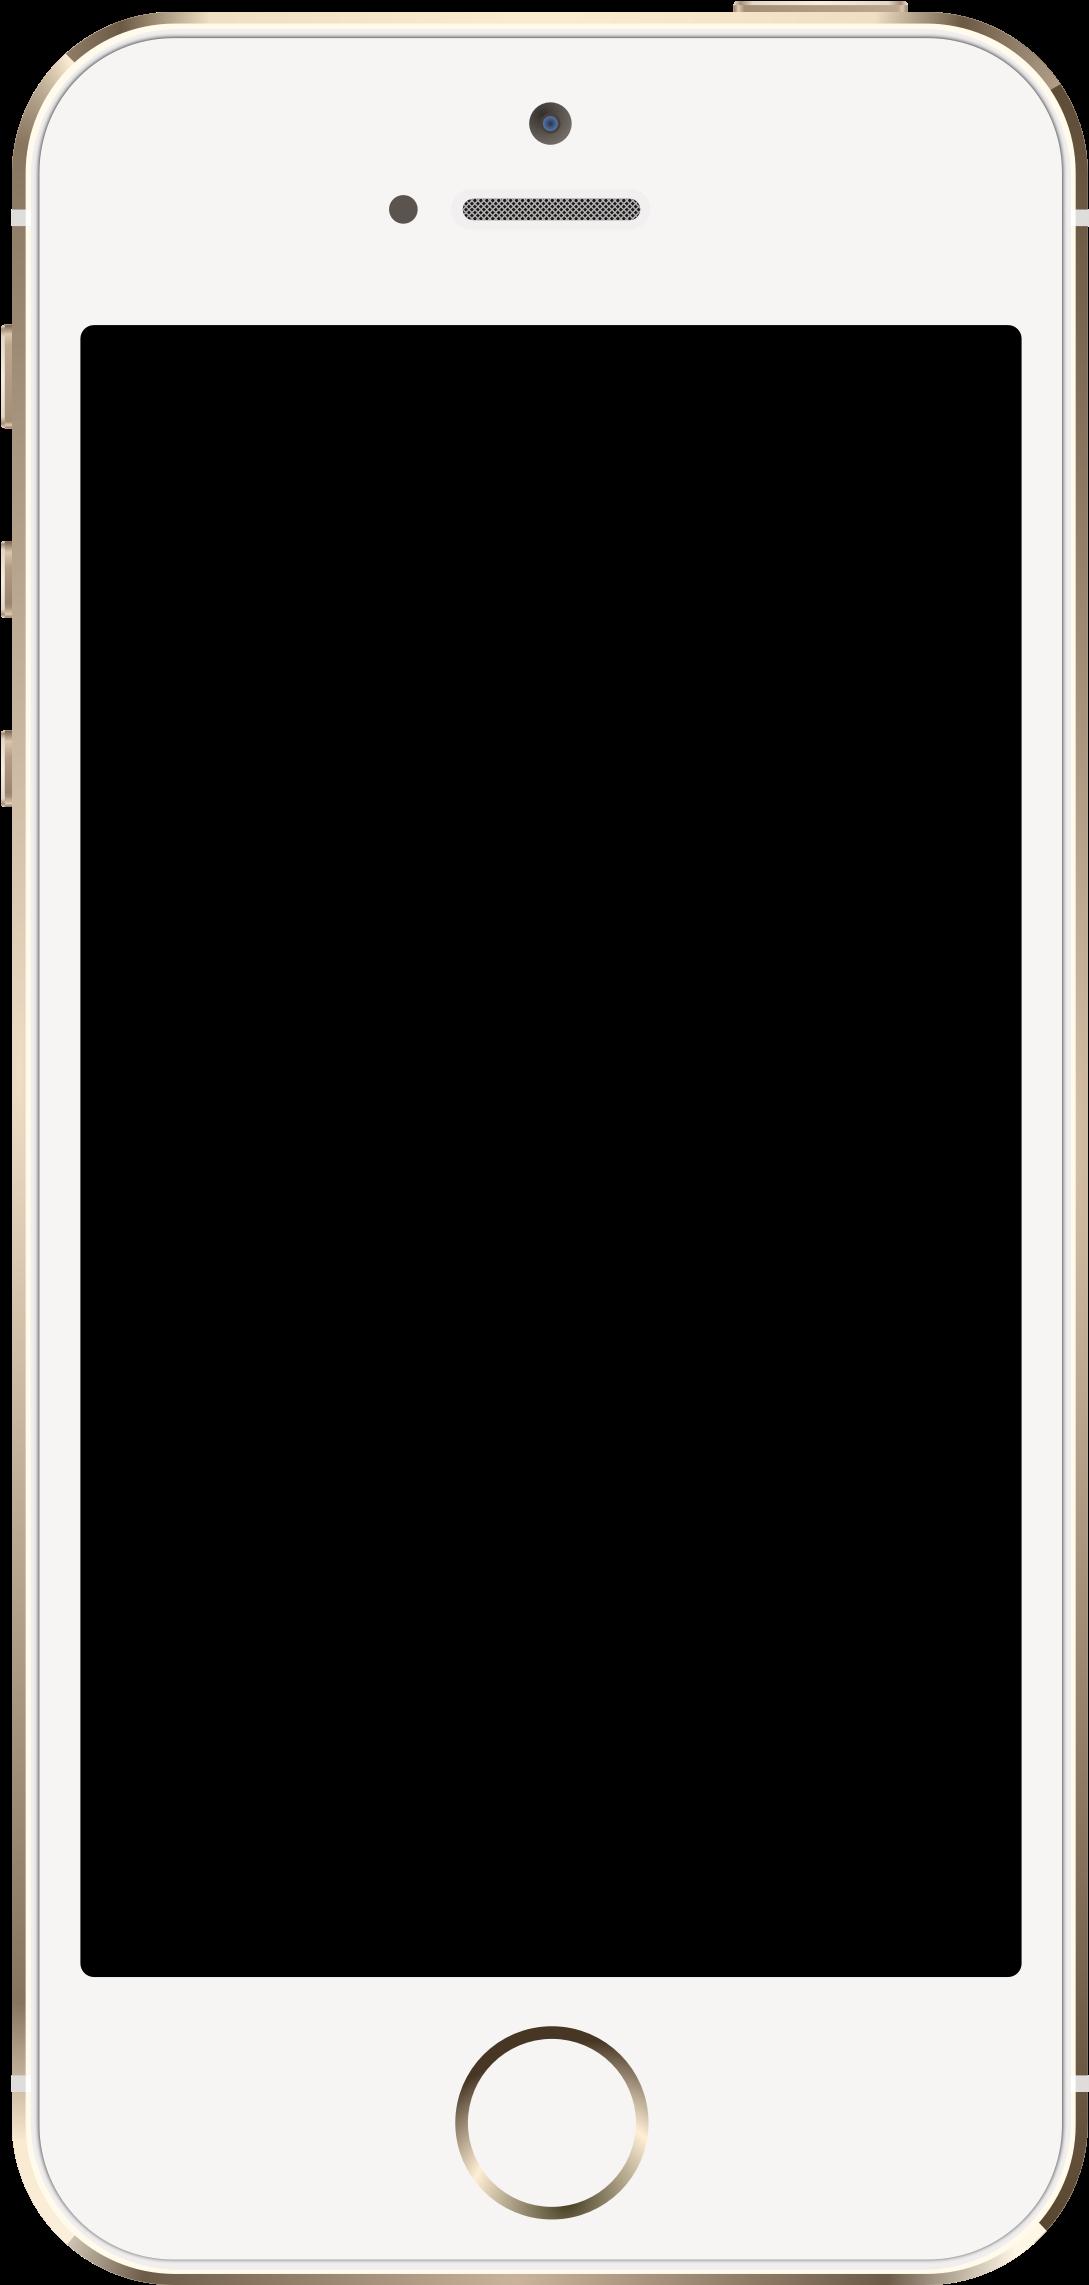 Iphone 5s Clip Art Gallery.